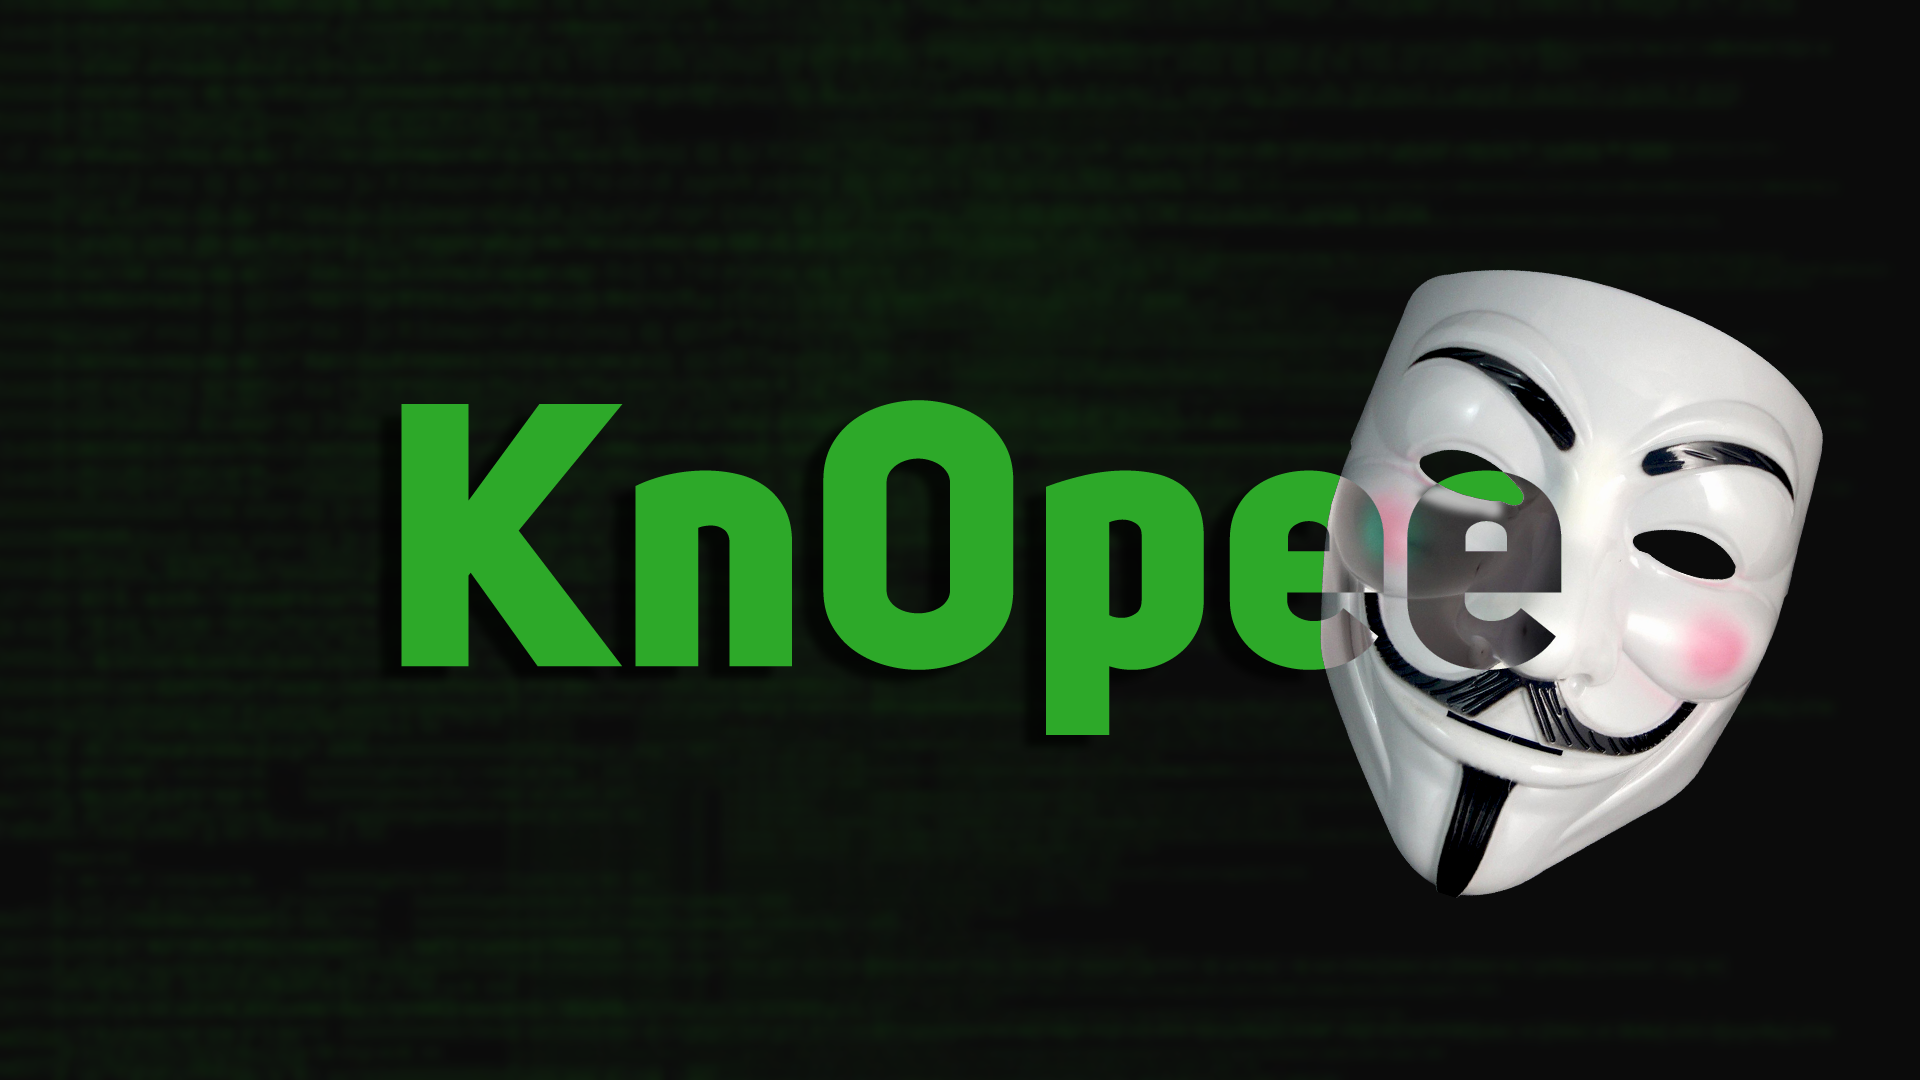 kn0pee - Fat Duck Gaming Community